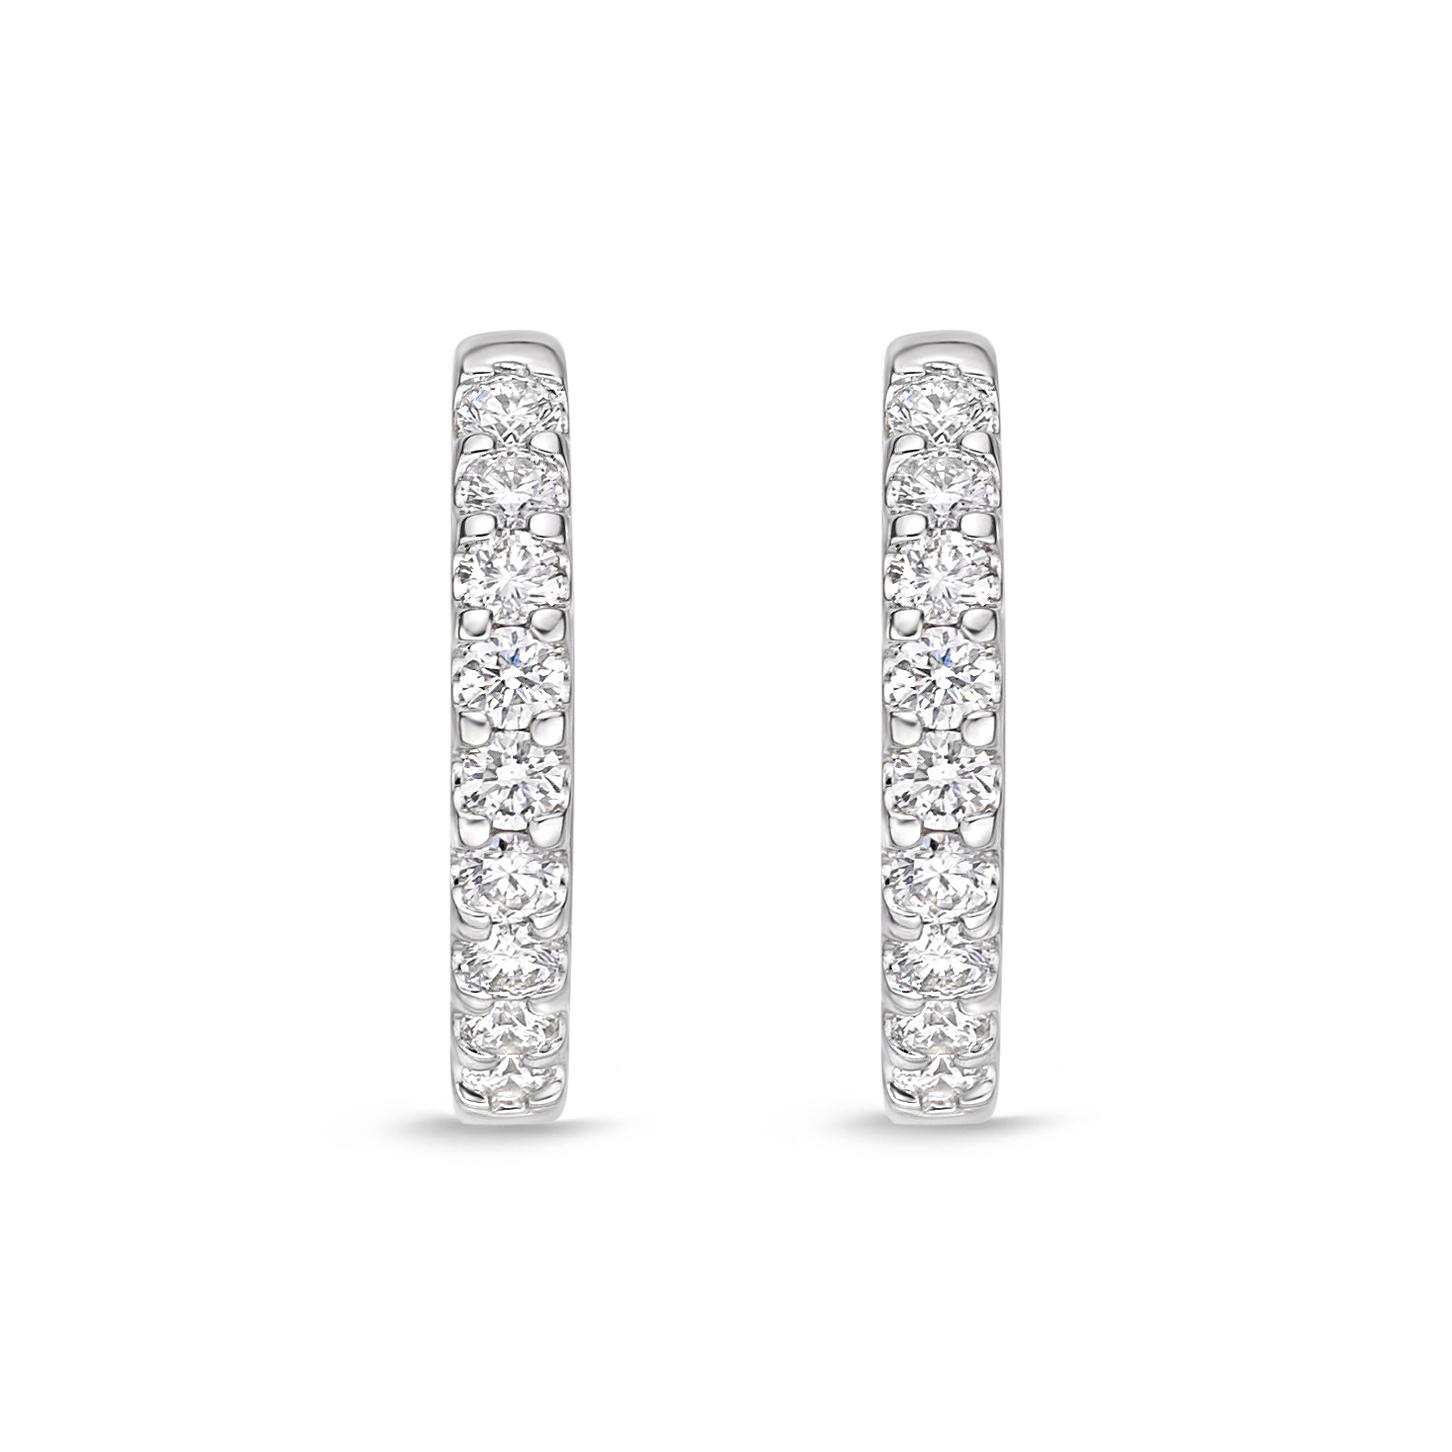 Memoire 18ct White Gold 1/4 Carat Diamond Huggies 12x12mm